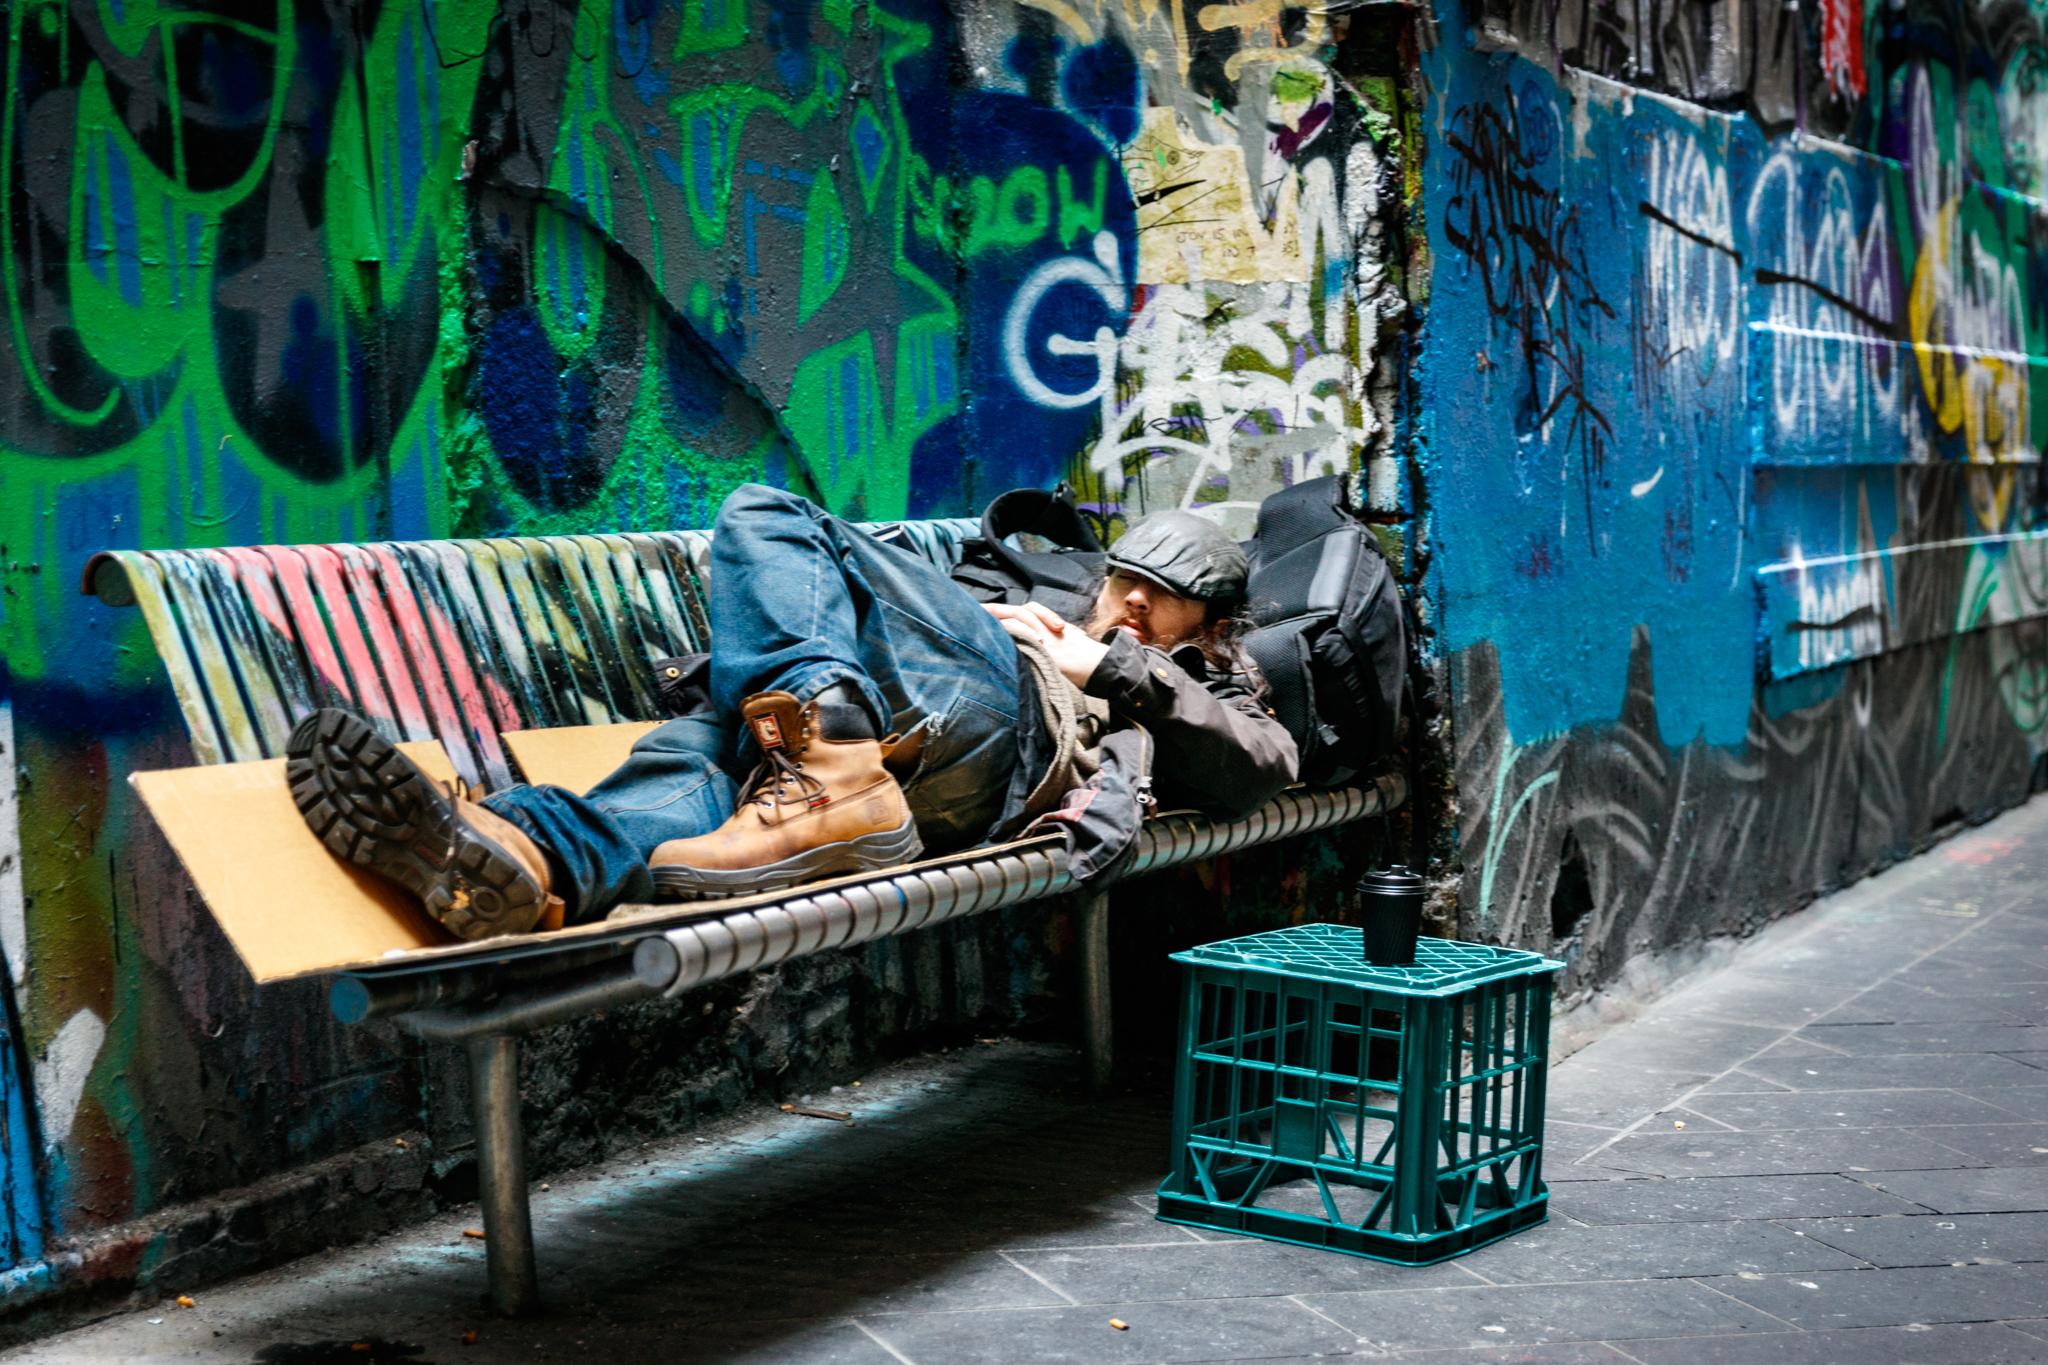 sleeping-homelessman1.jpg